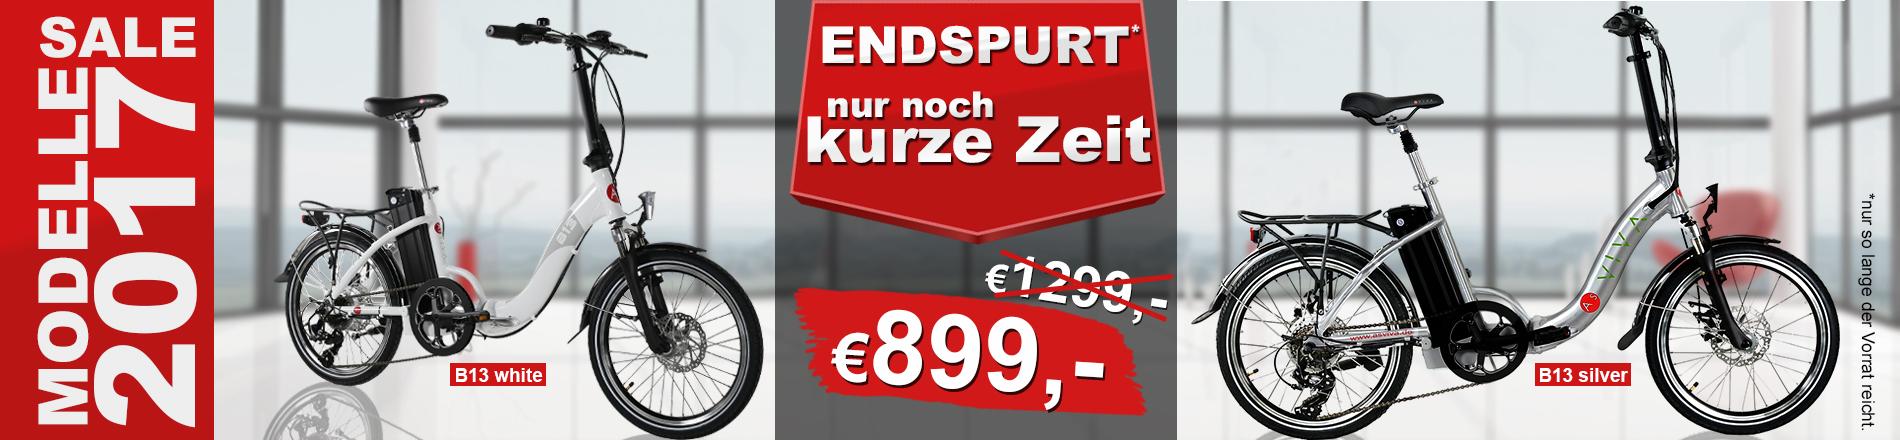 E-BIKE KLAPPRAD SALE ASVIVA E-BIKE B13 GUTSCHEIN 12%